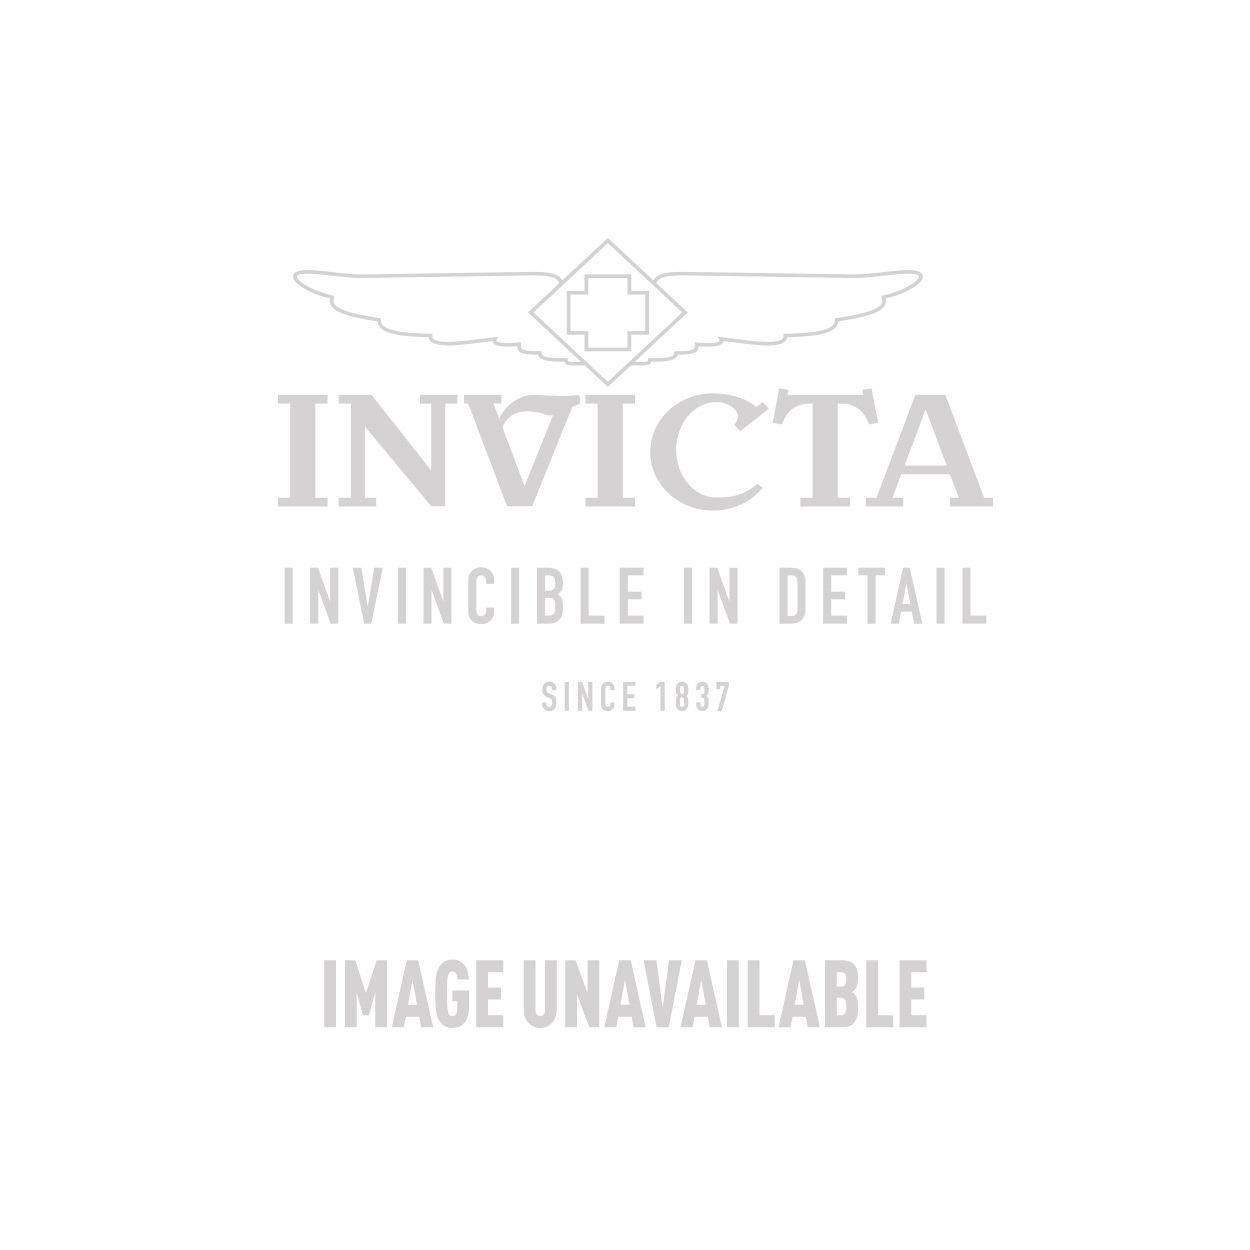 Invicta I-Force Quartz Watch - Black case with Black tone Silicone band - Model 16974